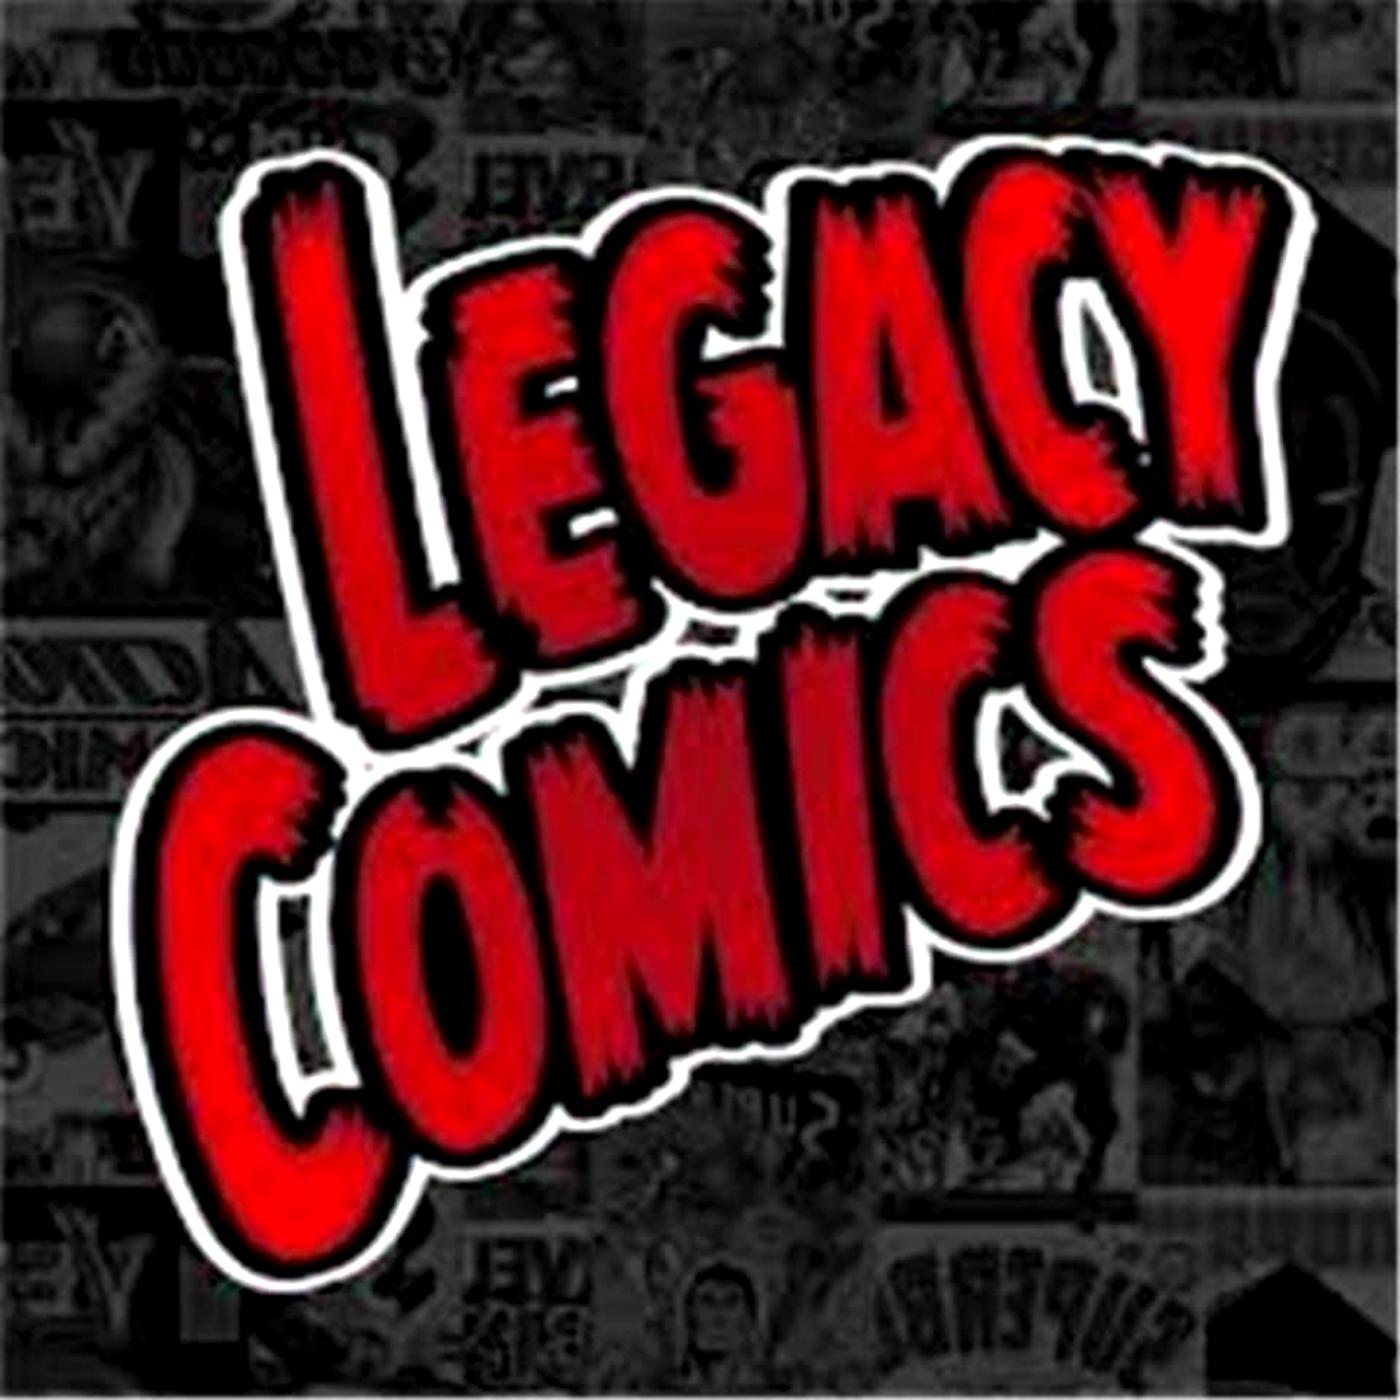 Legacy Comics:   A History